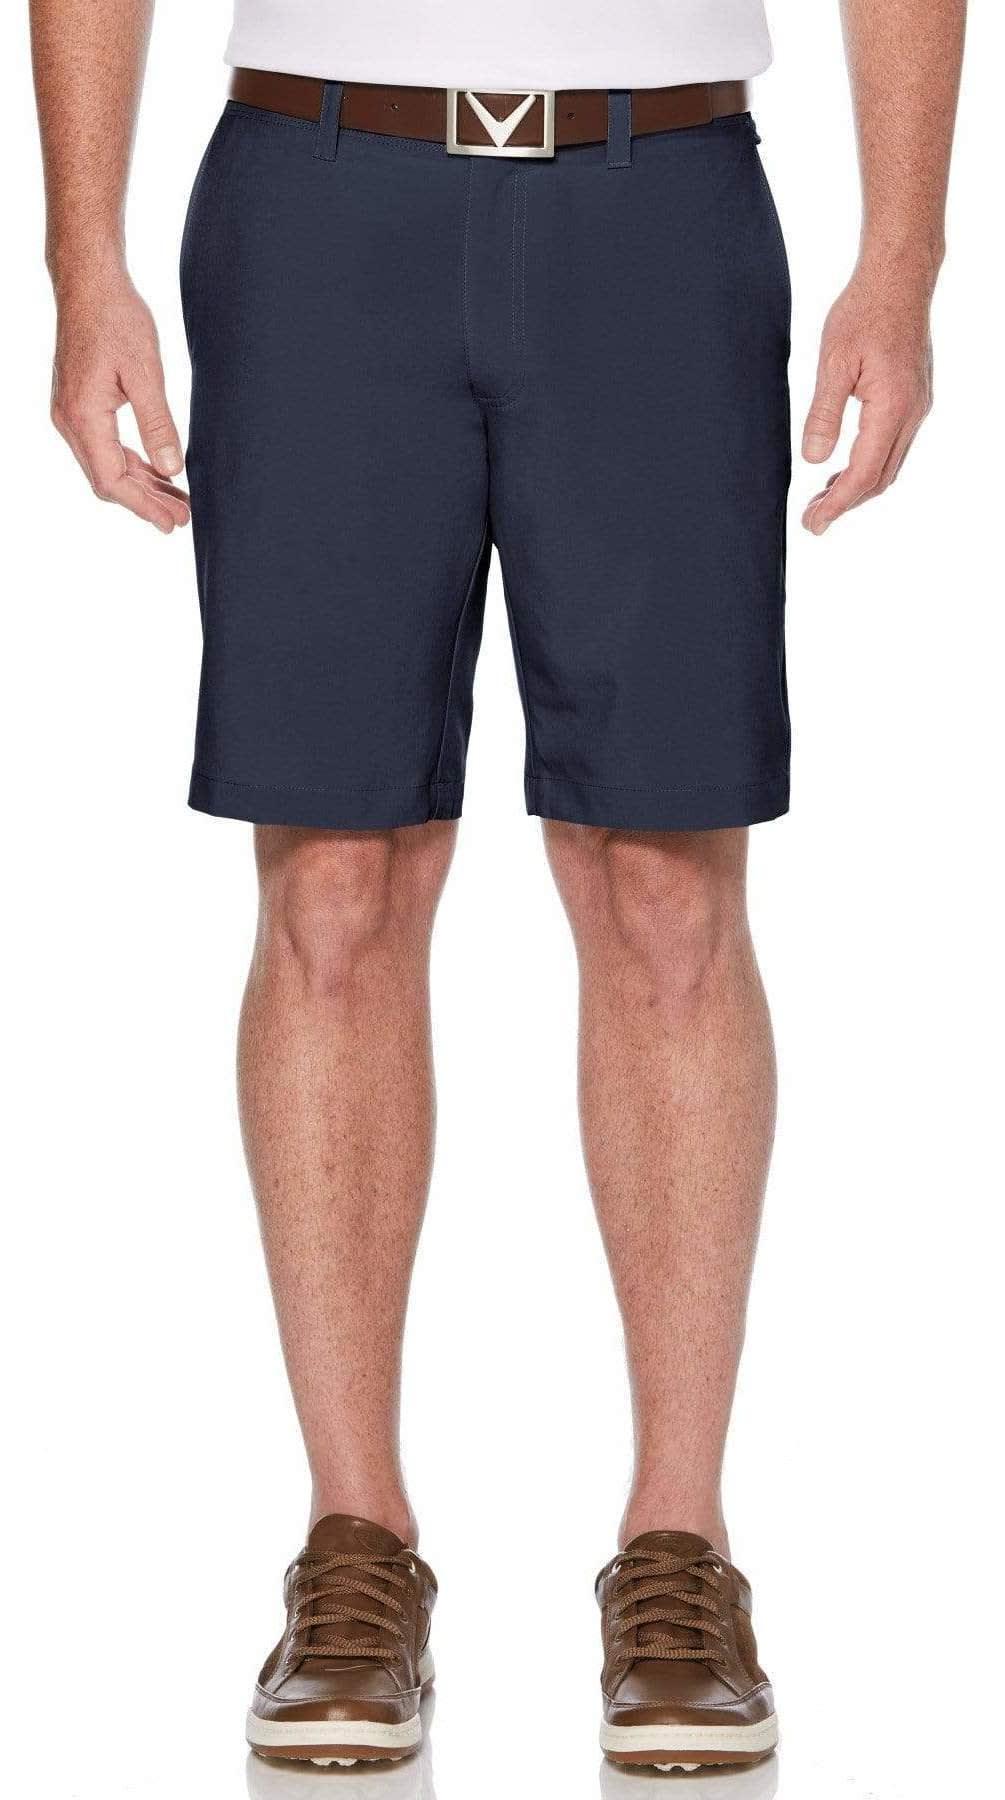 Callaway Men's Stretch Shorts